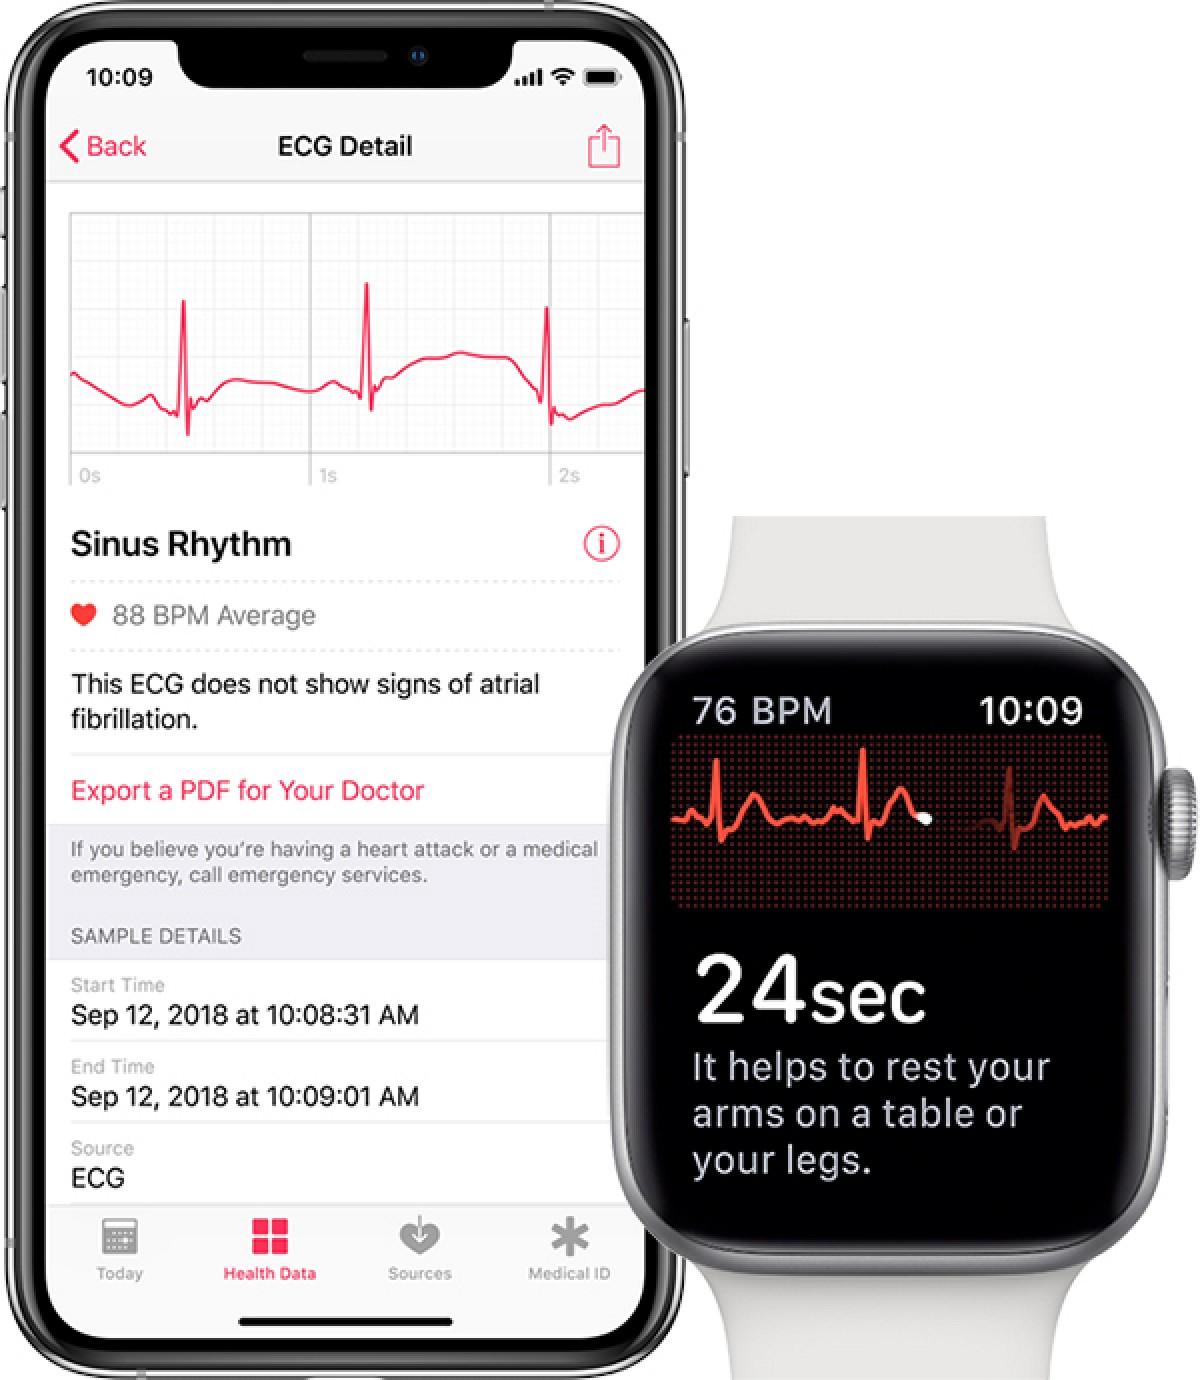 iphone apple watch ecg - Nové aktualizácie: HomePod, Shortcuts, tvOS a macOS Mojave 10.14.2 (+ EKG na Apple Watch)